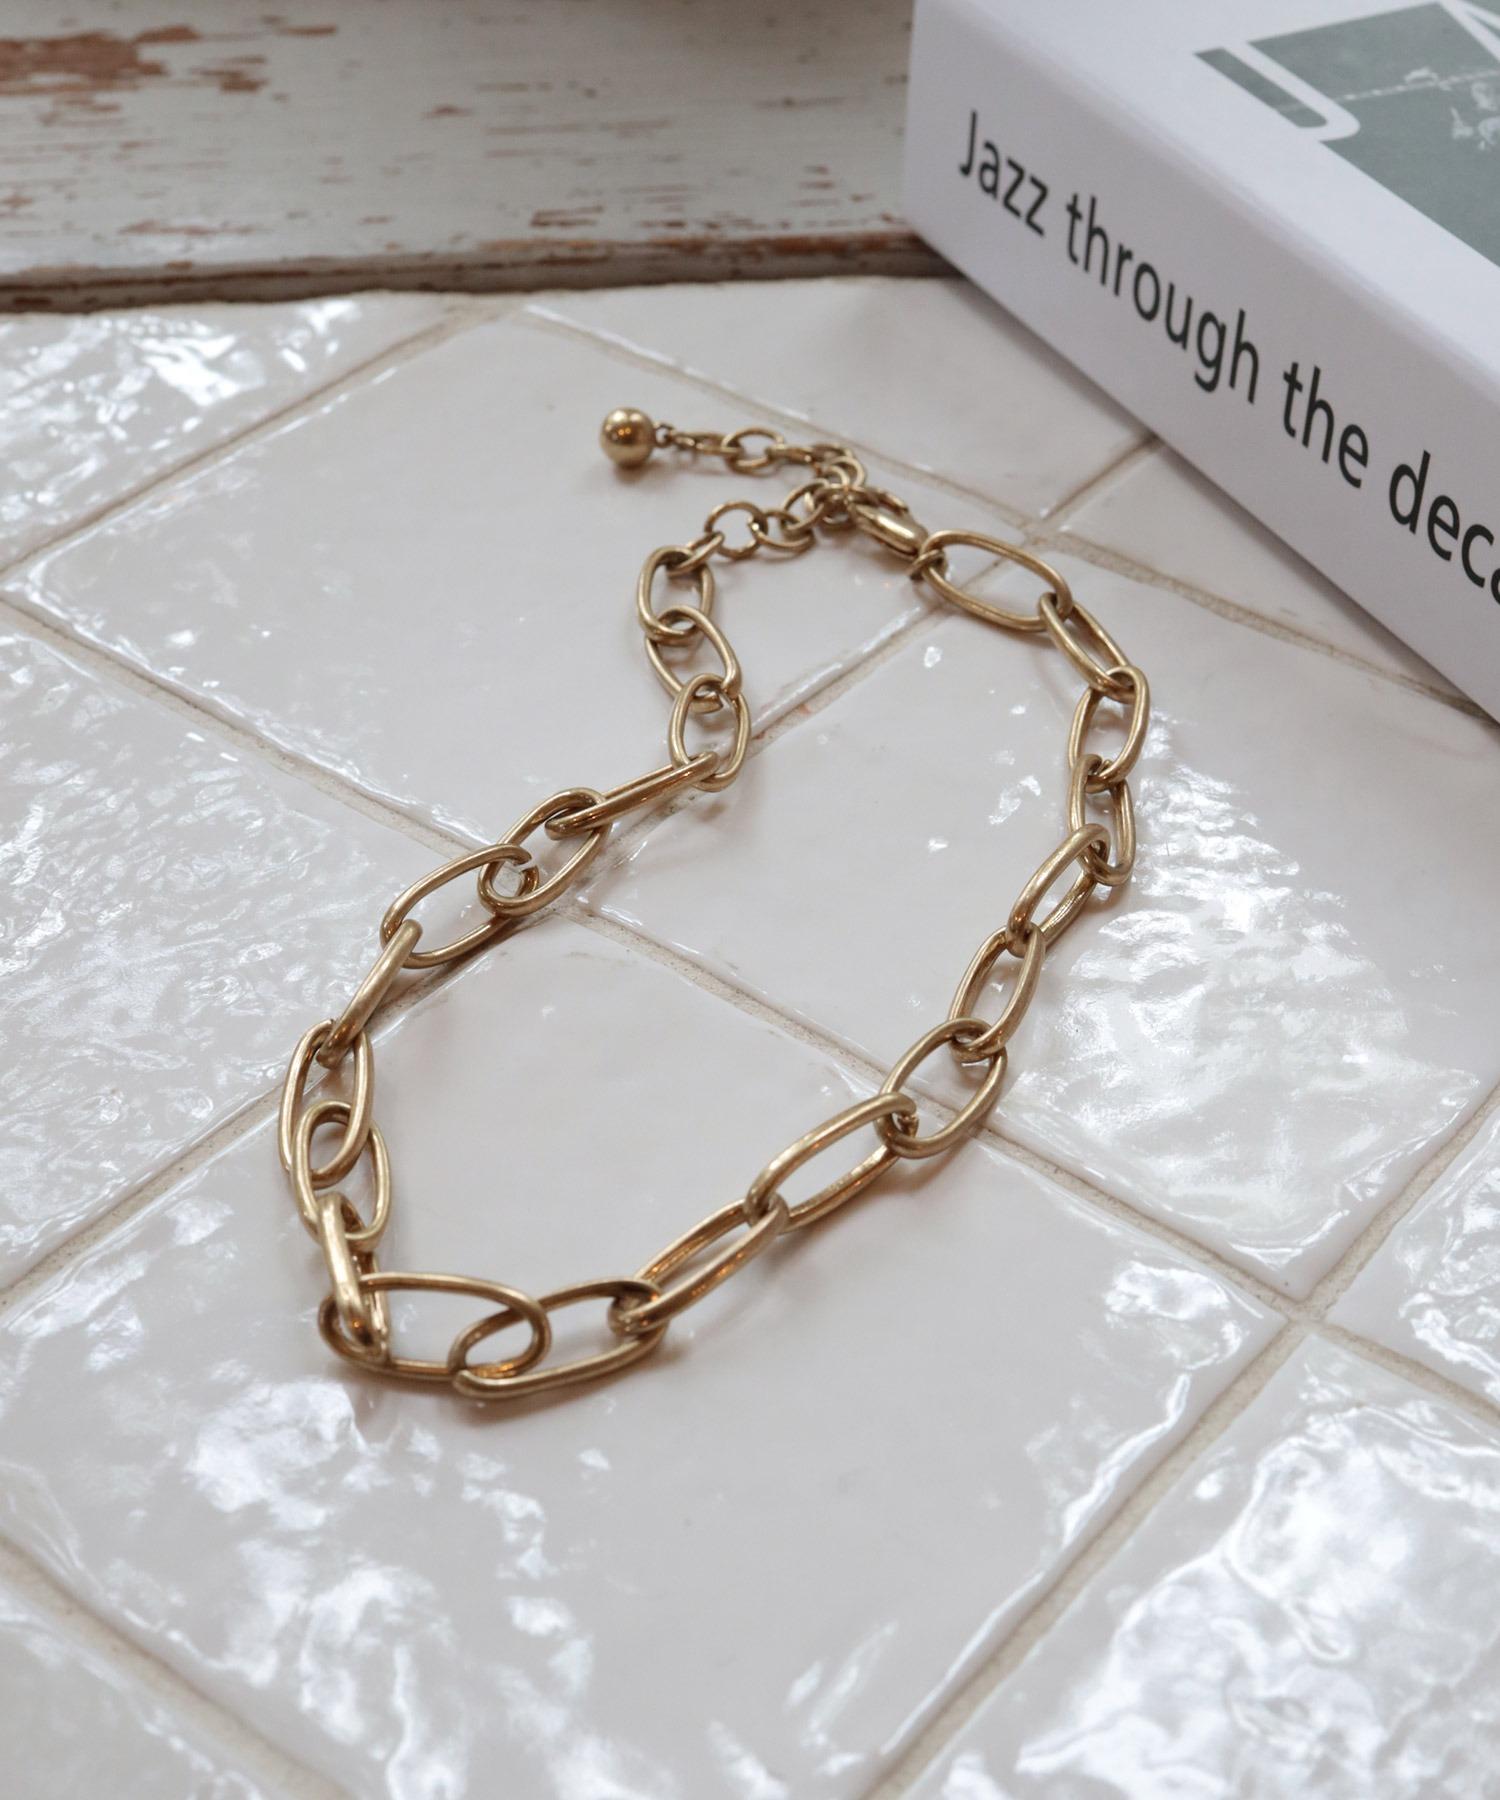 matt chain necklace